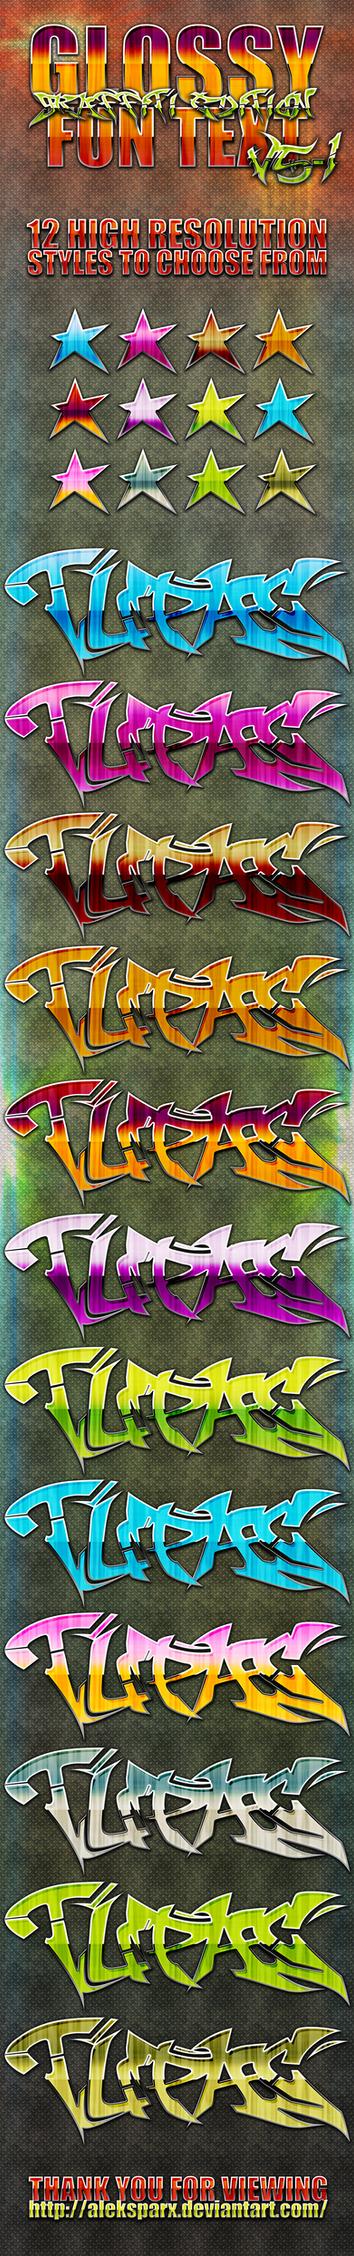 Genuine Glossy Graffiti Style by alekSparx